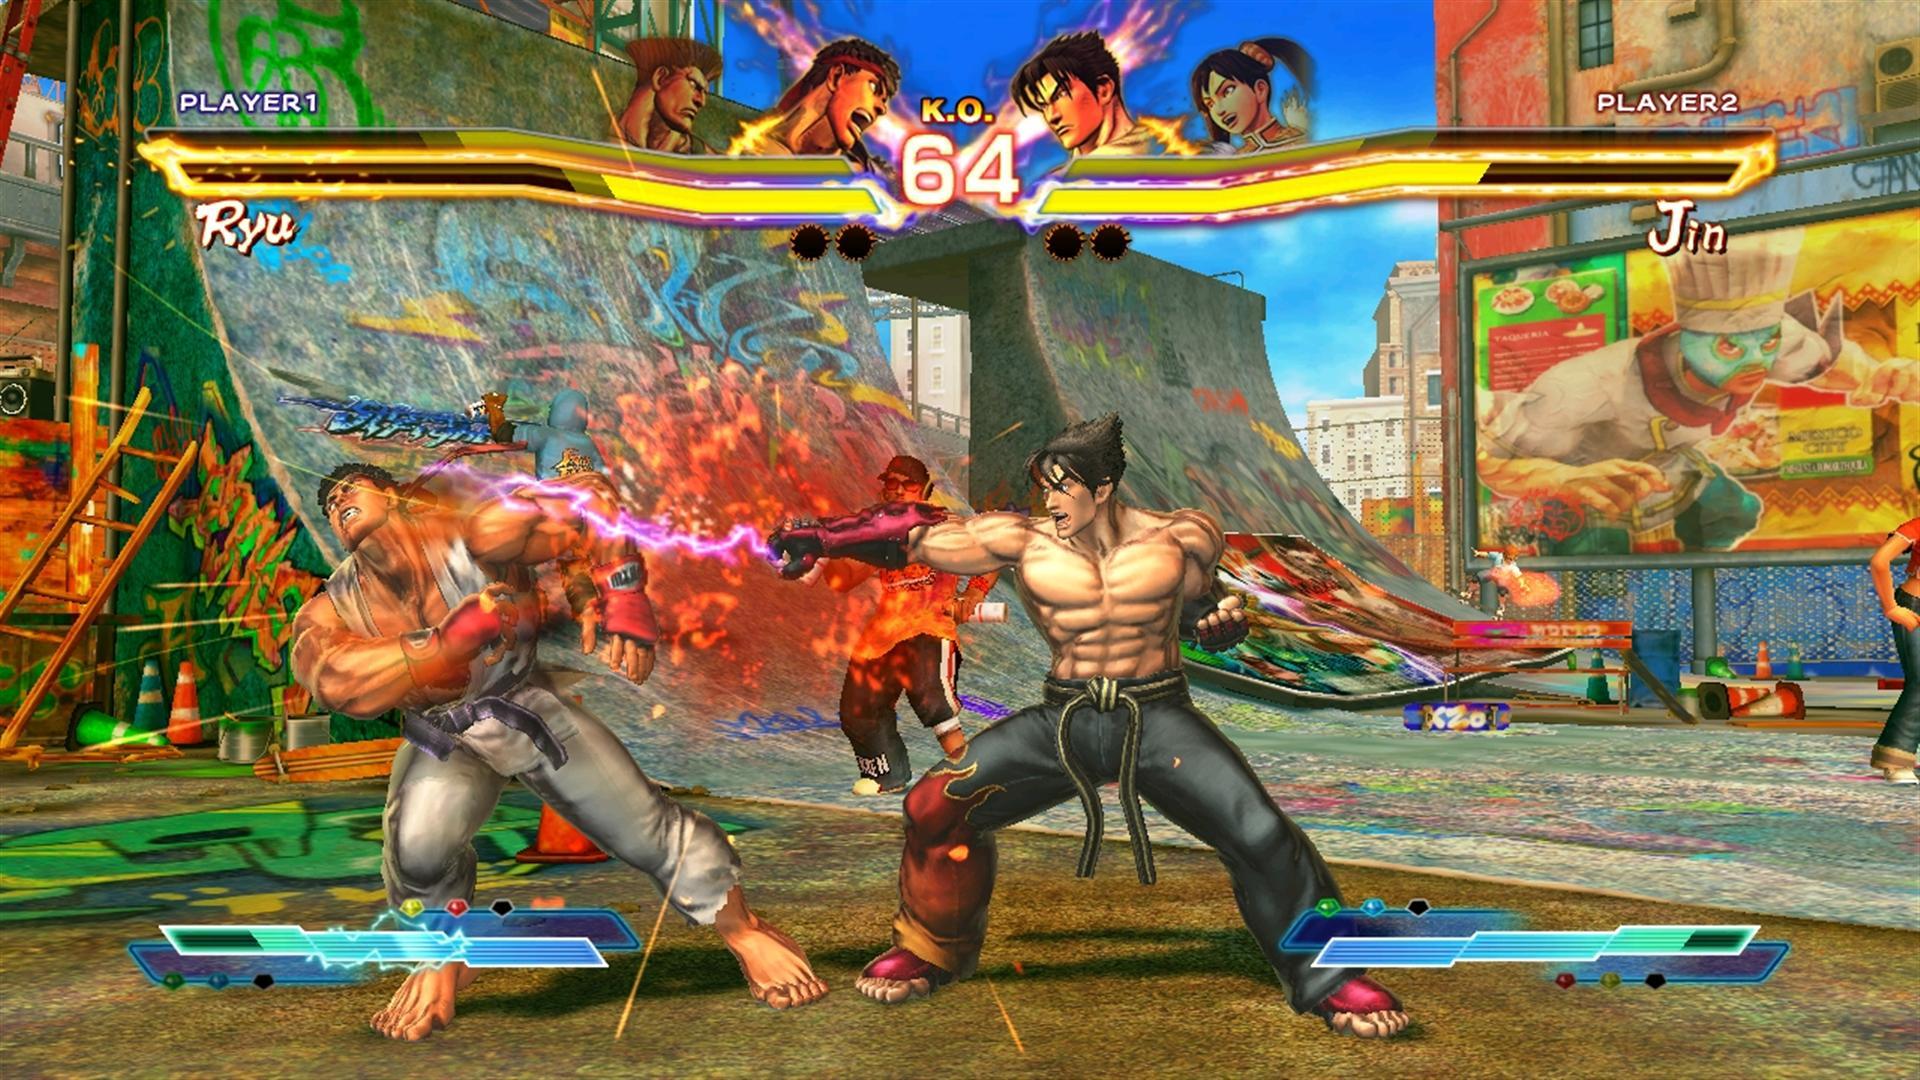 Street Fighter X Tekken - Games For Windows Live